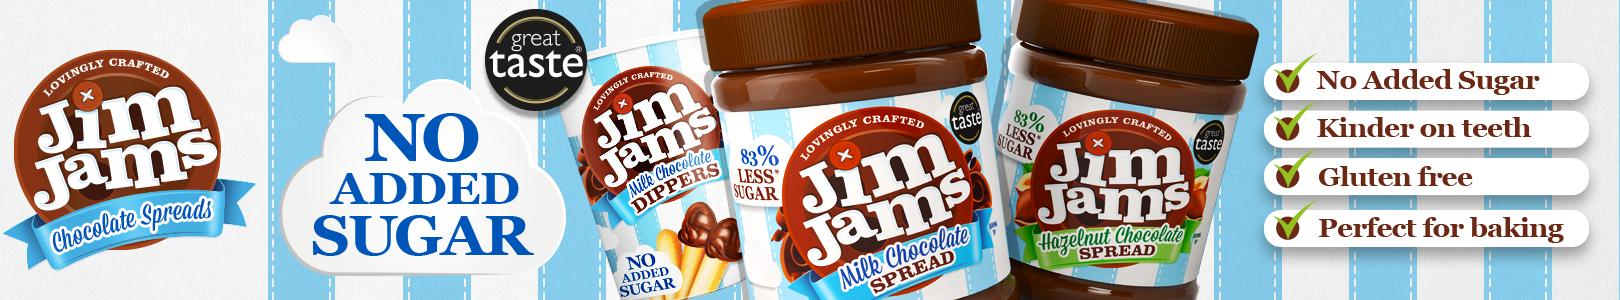 Kremy czekoladowe bez cukru Jim Jams